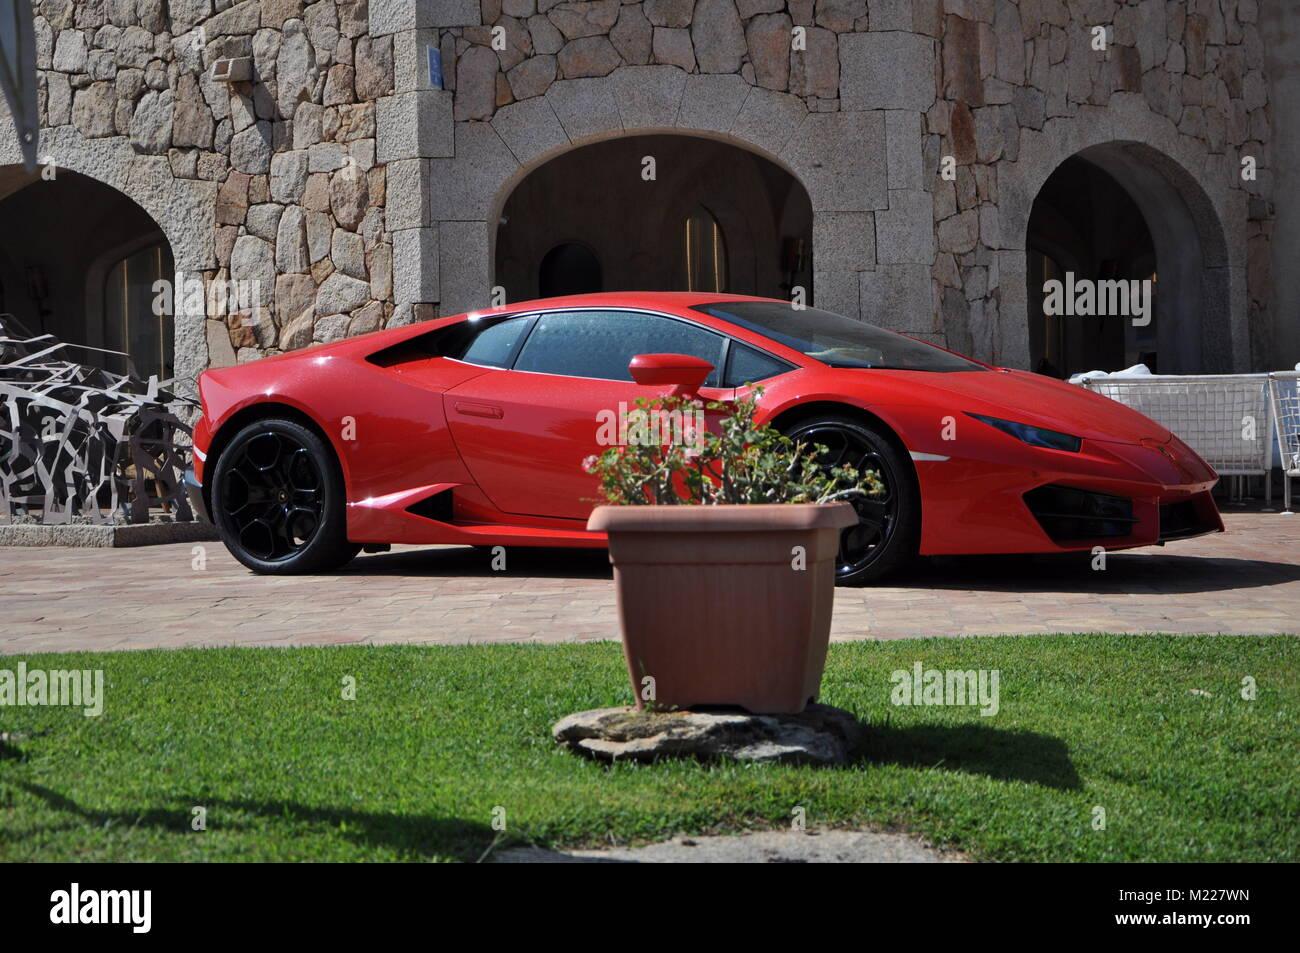 Porto Cervo, Italy - June 19, 2017: Lamborghini Huracan - Stock Image